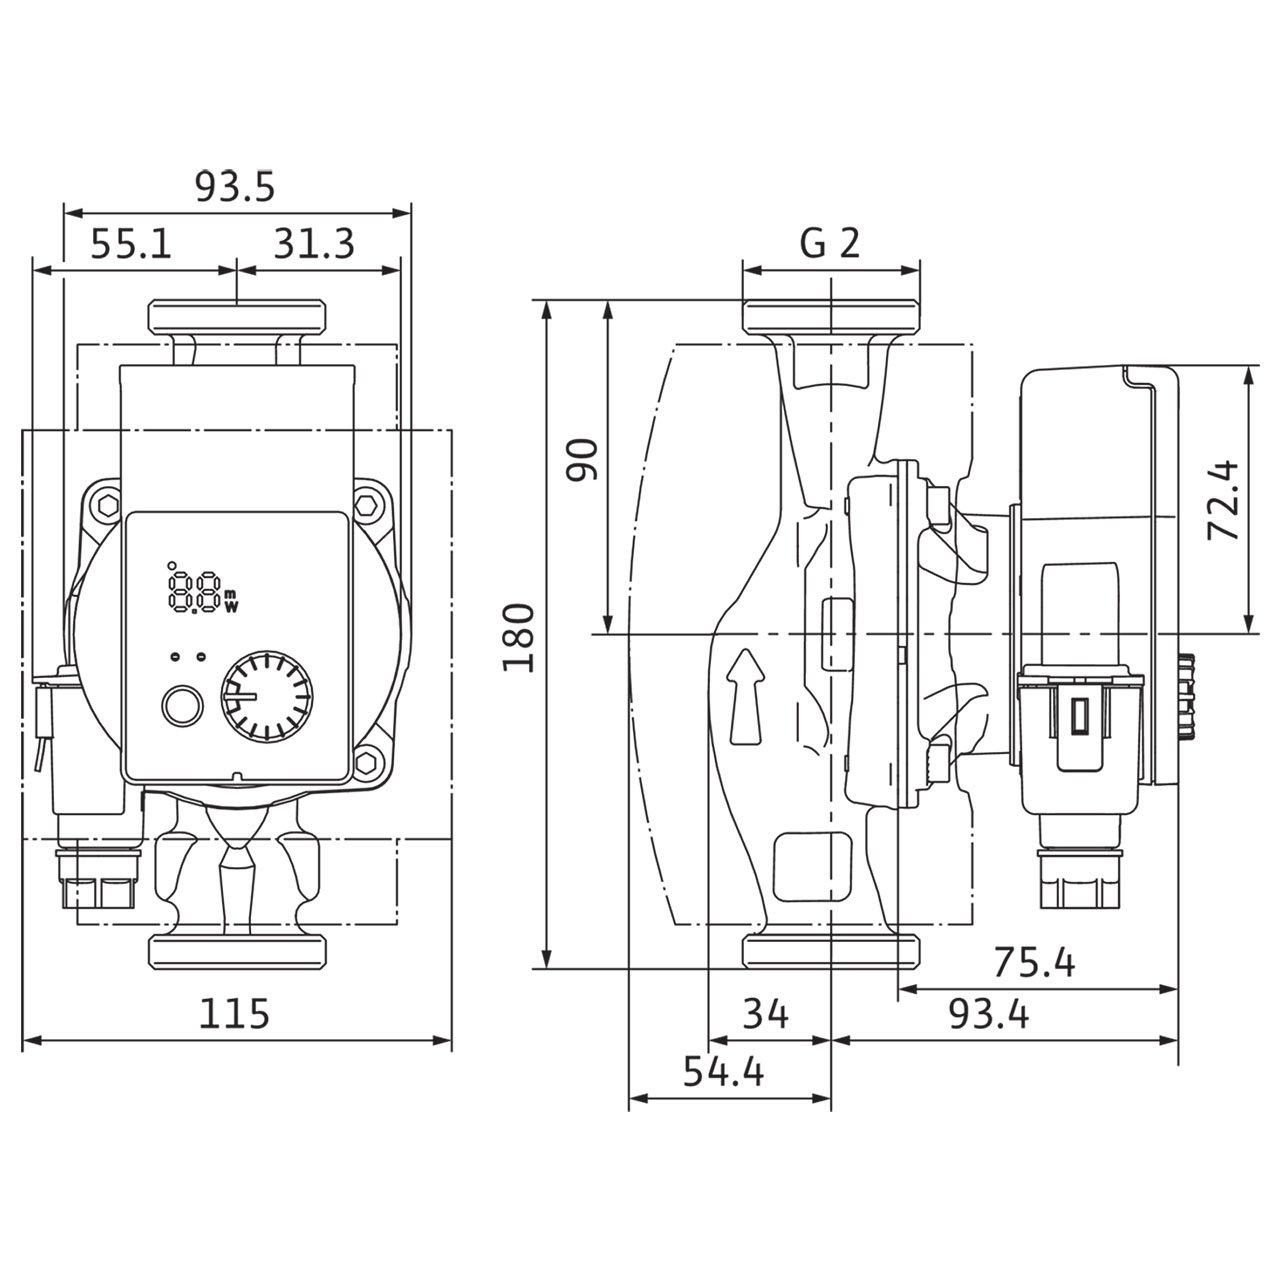 Wilo Wilo Pompe /à haut rendement Yonos PICO plus rotor humide type 30//1-6 Rp 1 1//4 G 2 180mm